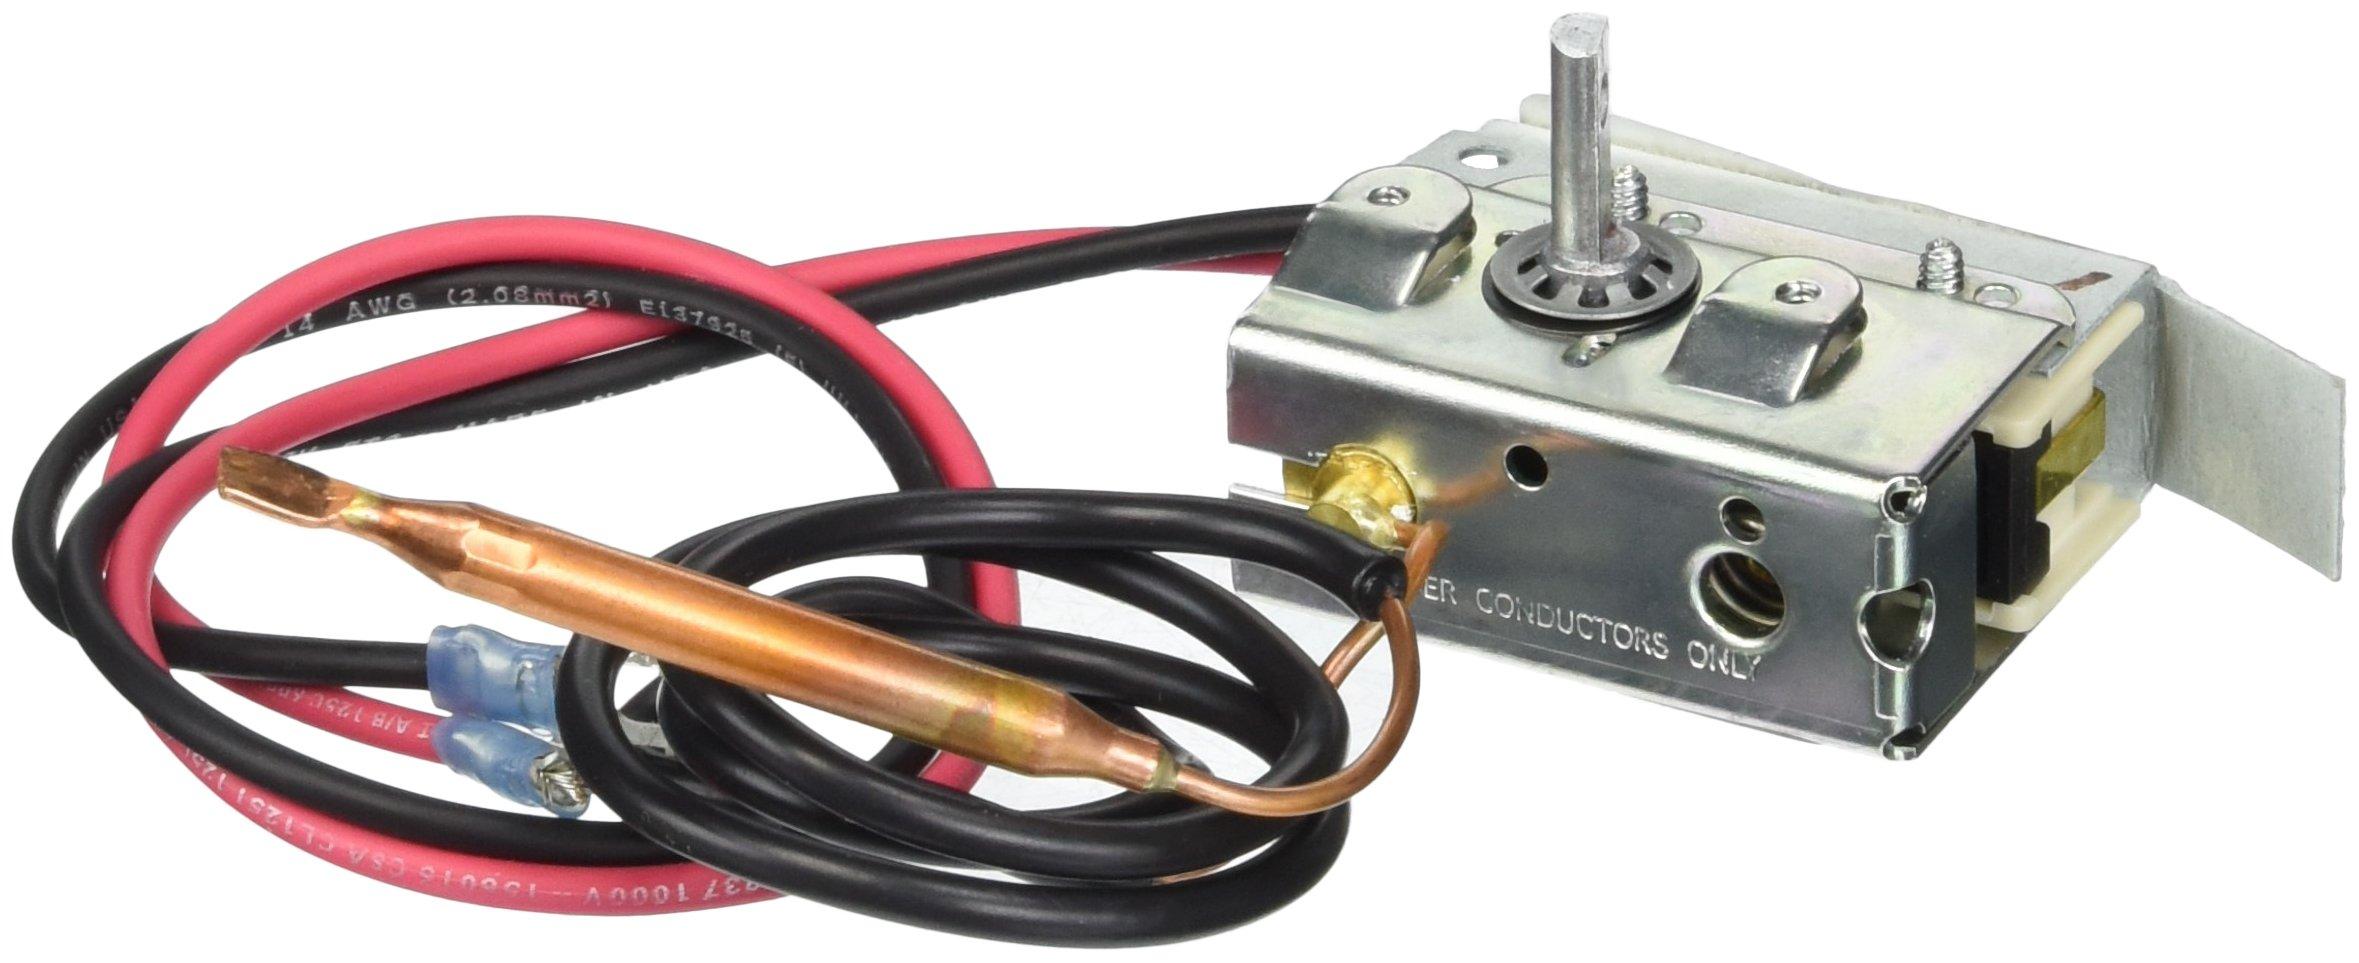 Marley UHMT1 Internal 1-Pole Thermostat by Marley